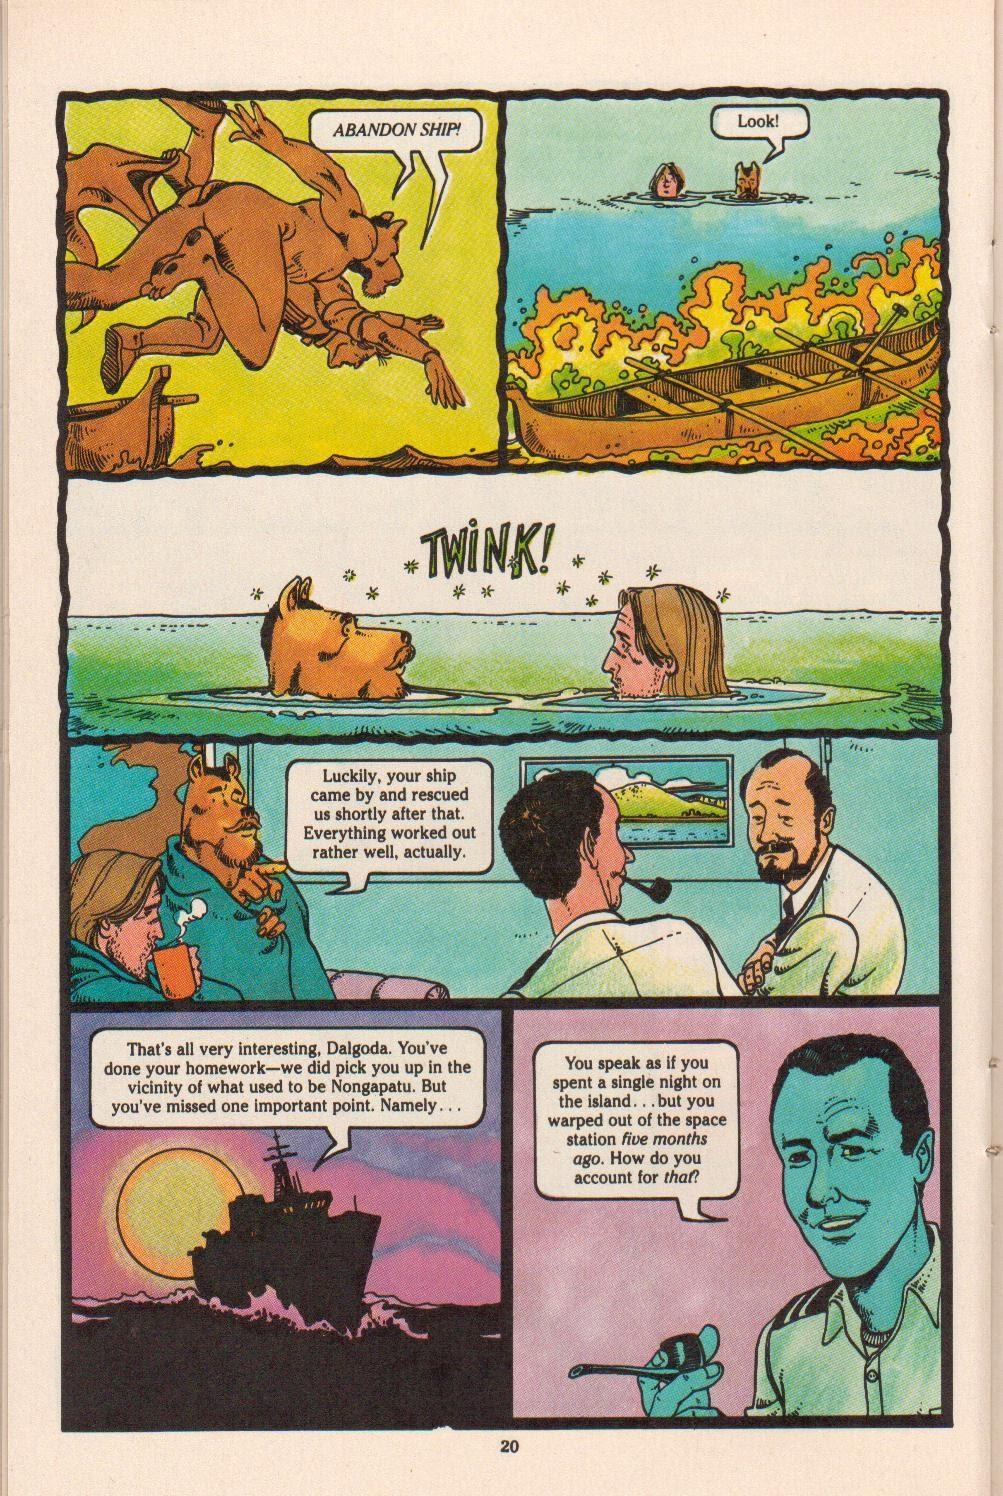 Read online Dalgoda comic -  Issue #4 - 22